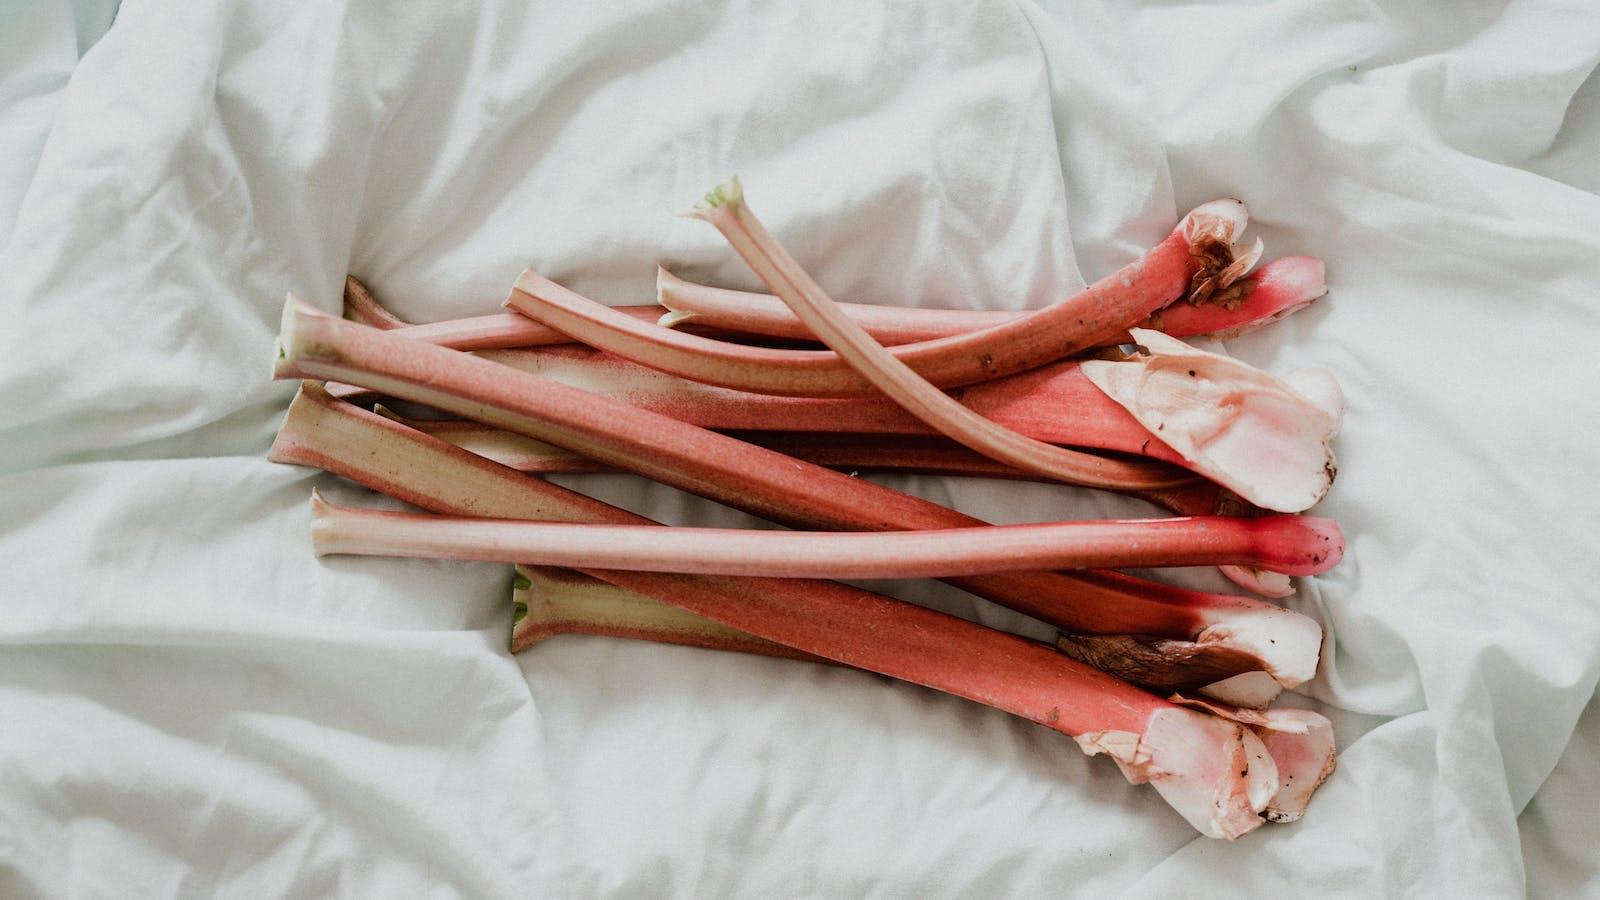 Plant de rhubarbe